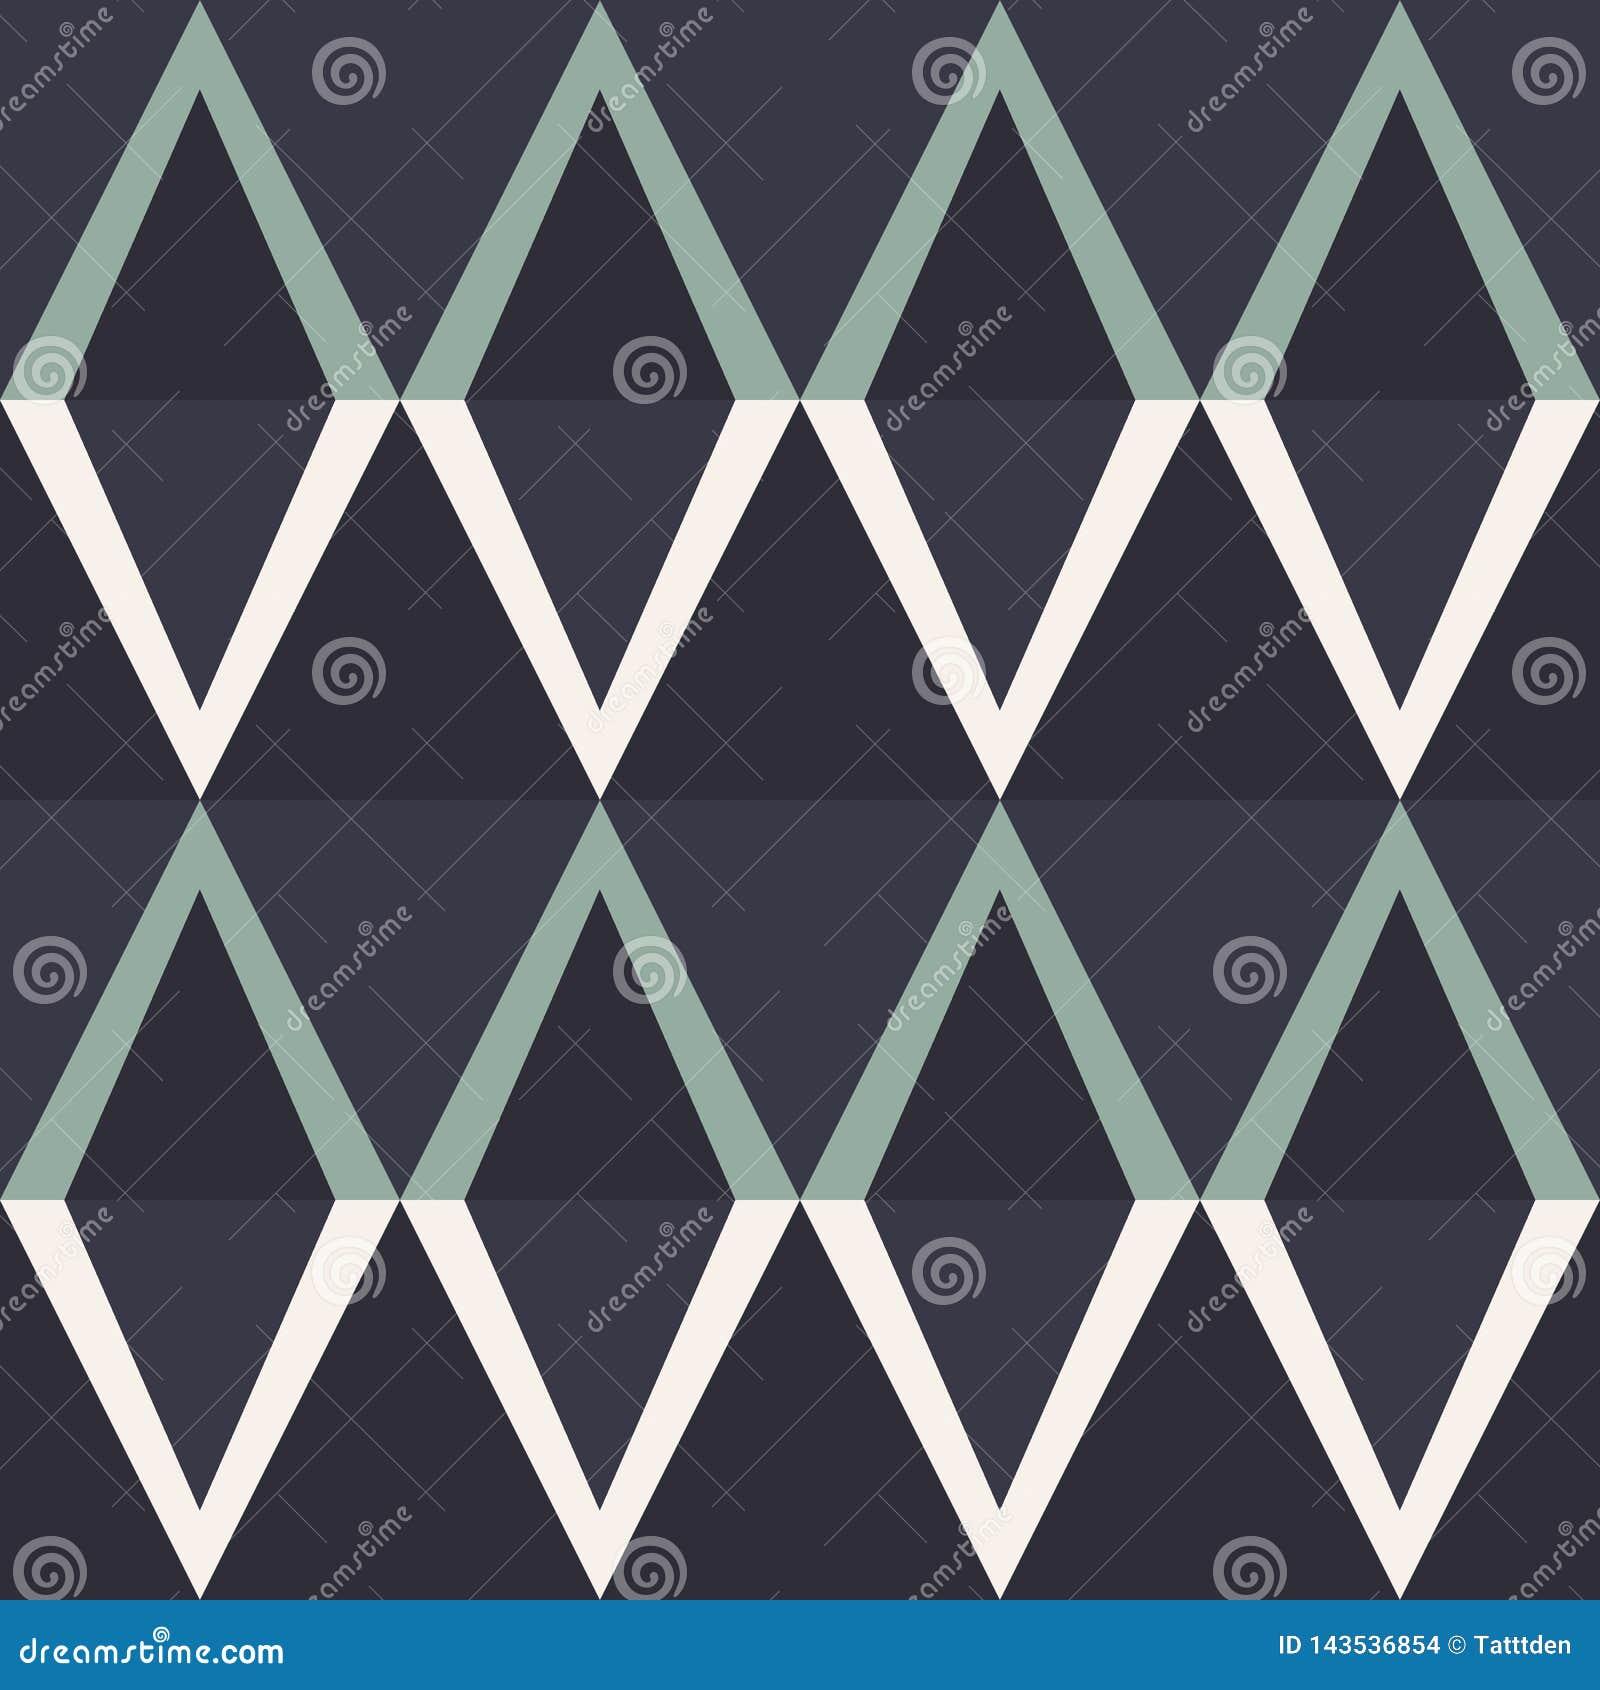 Scandinavian Trendy Style Seamless Minimal Geometric Pretty